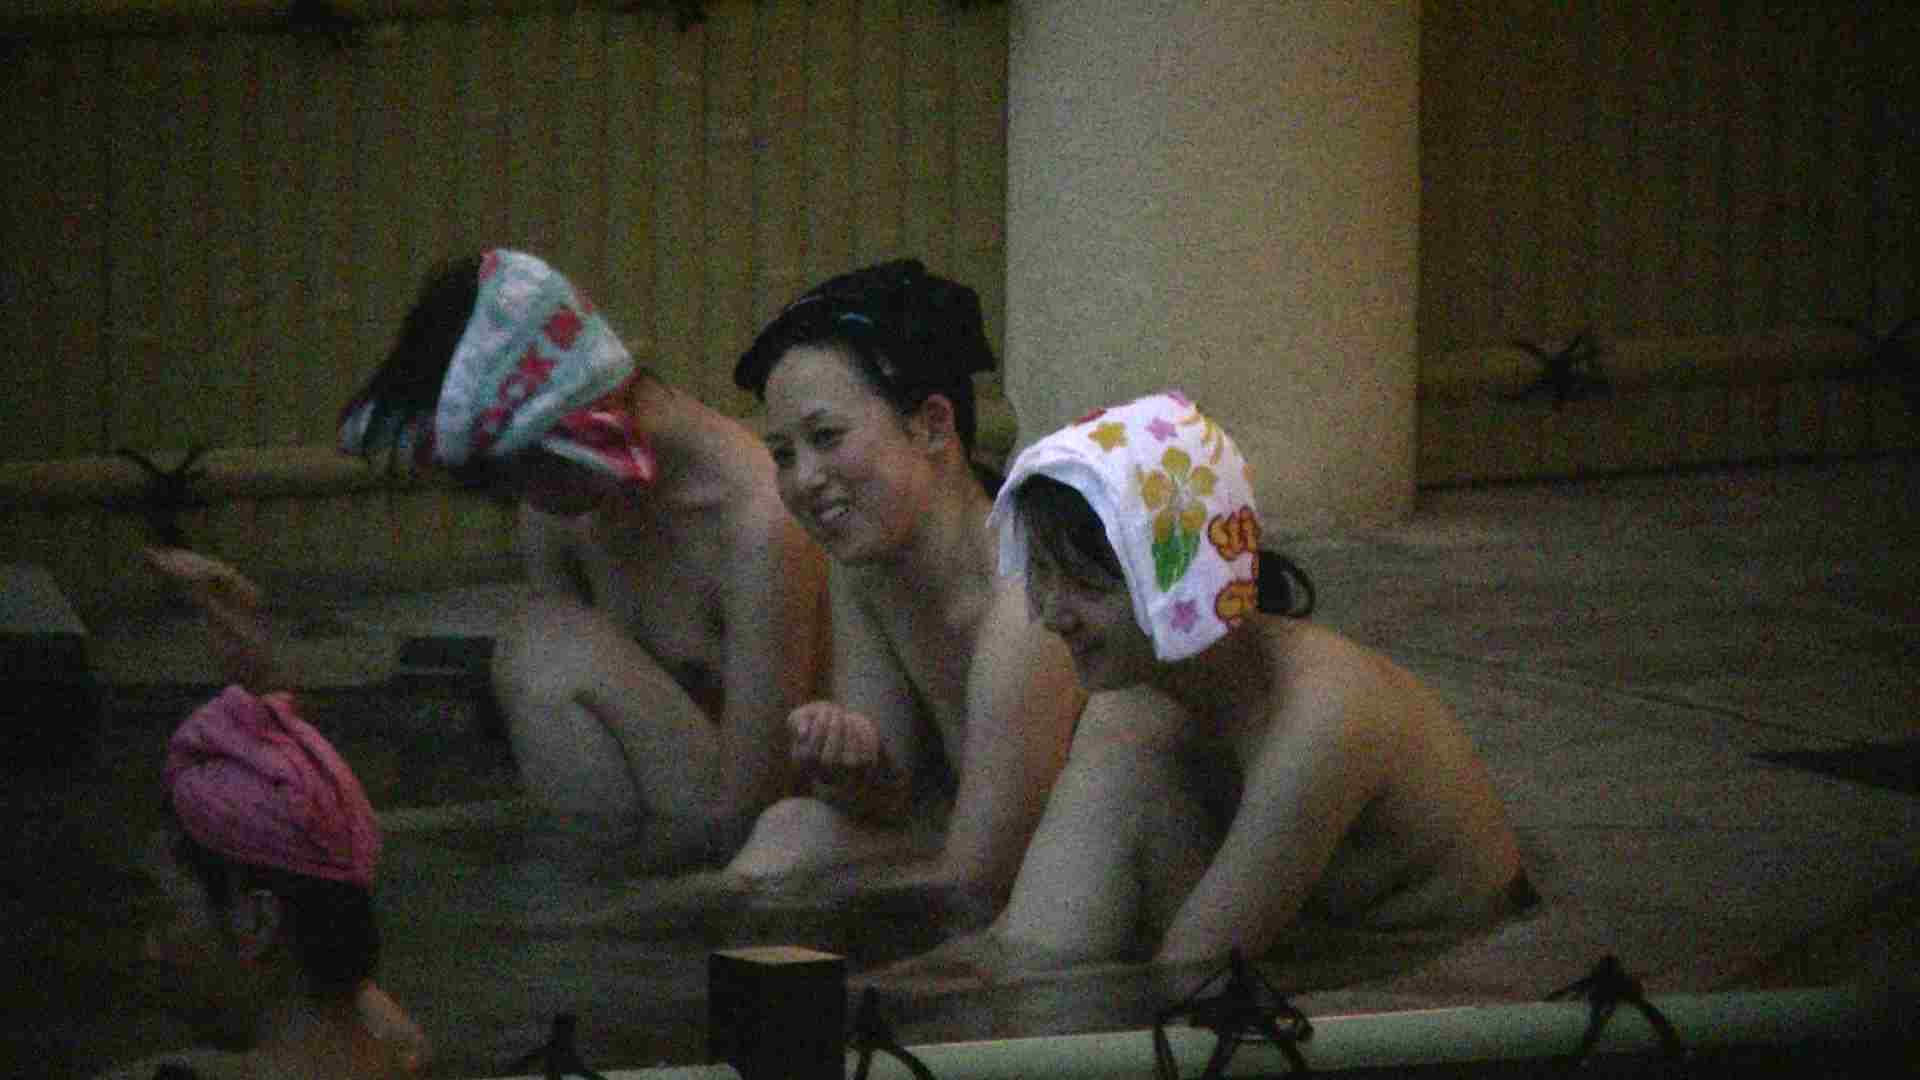 Aquaな露天風呂Vol.149 露天風呂突入 オマンコ動画キャプチャ 101pic 71